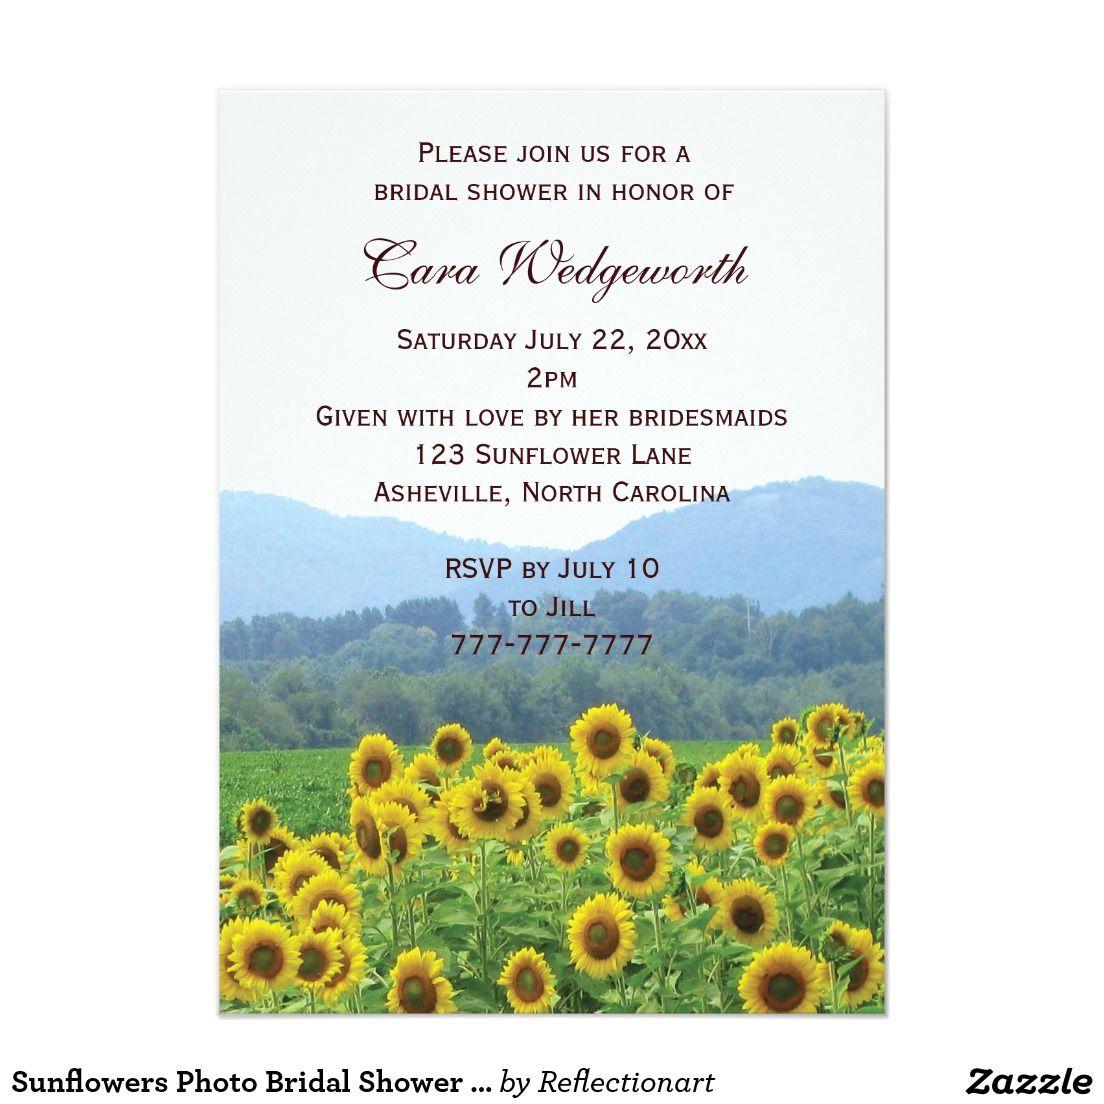 Sunflowers Photo Bridal Shower Invitation | Sunflower wedding ...